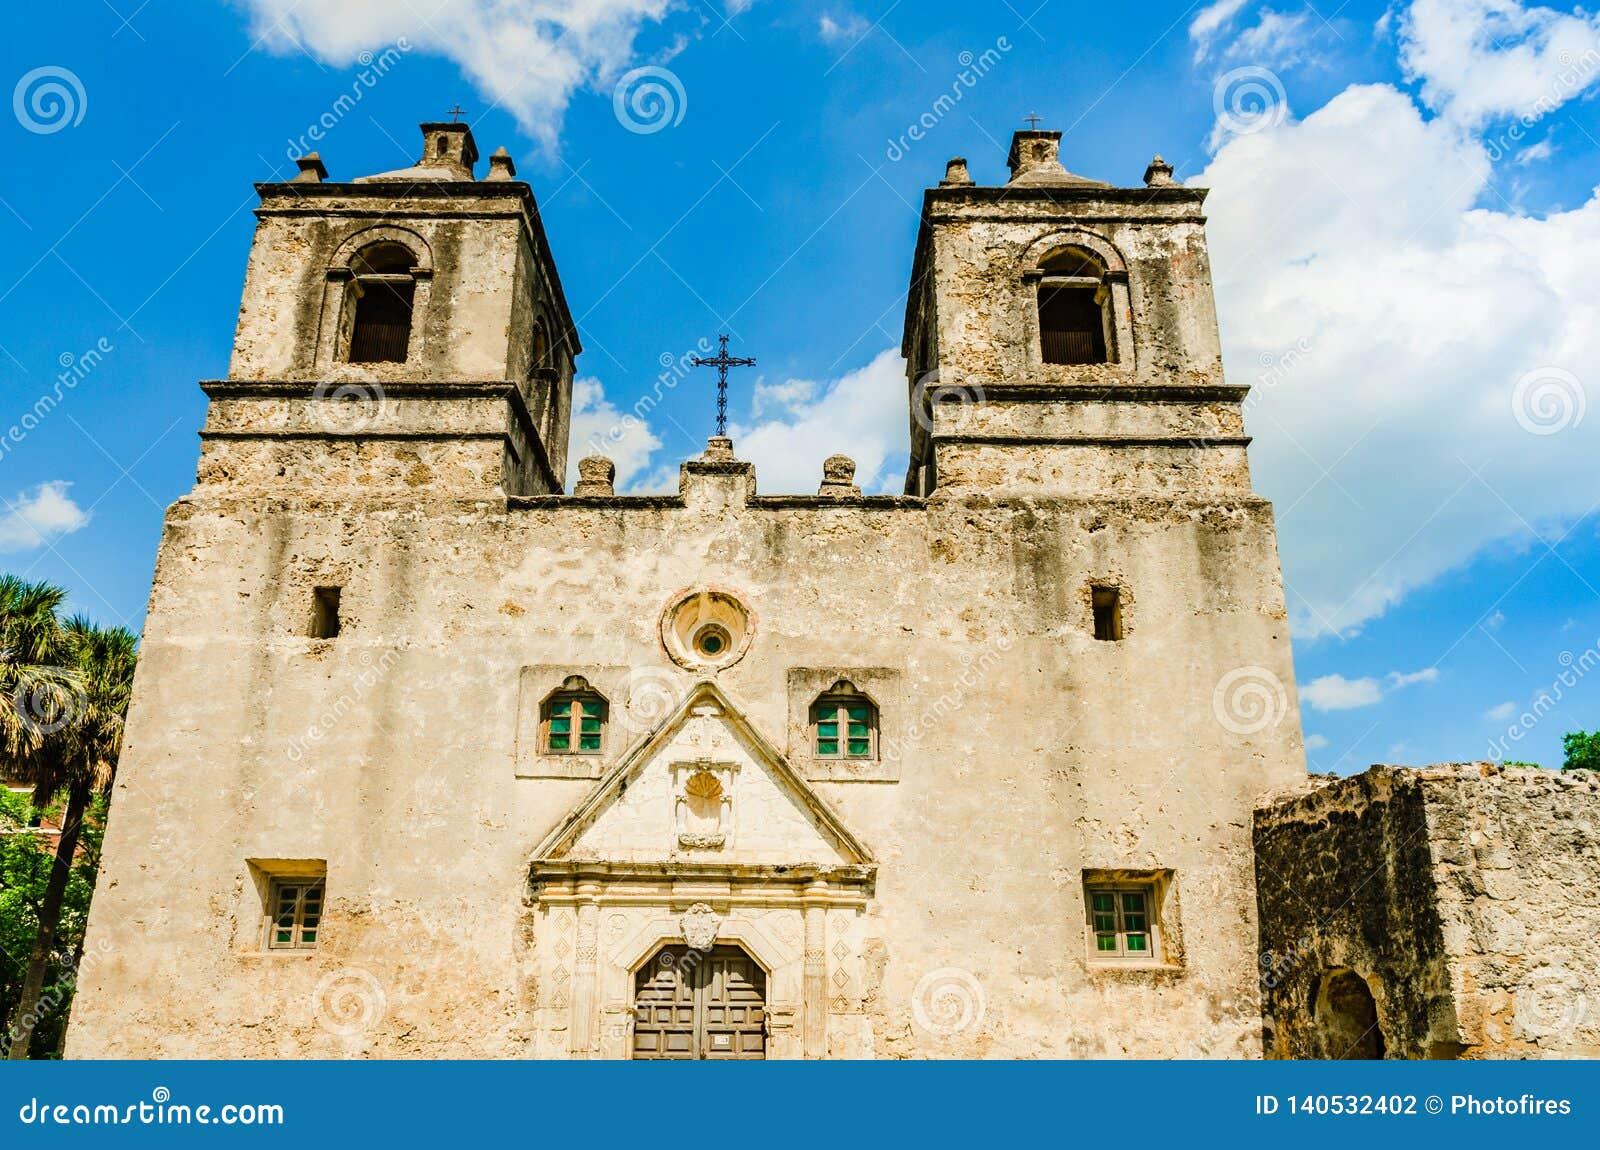 Facade Of The Mission Concepcion In San Antonio Texas Stock Photo